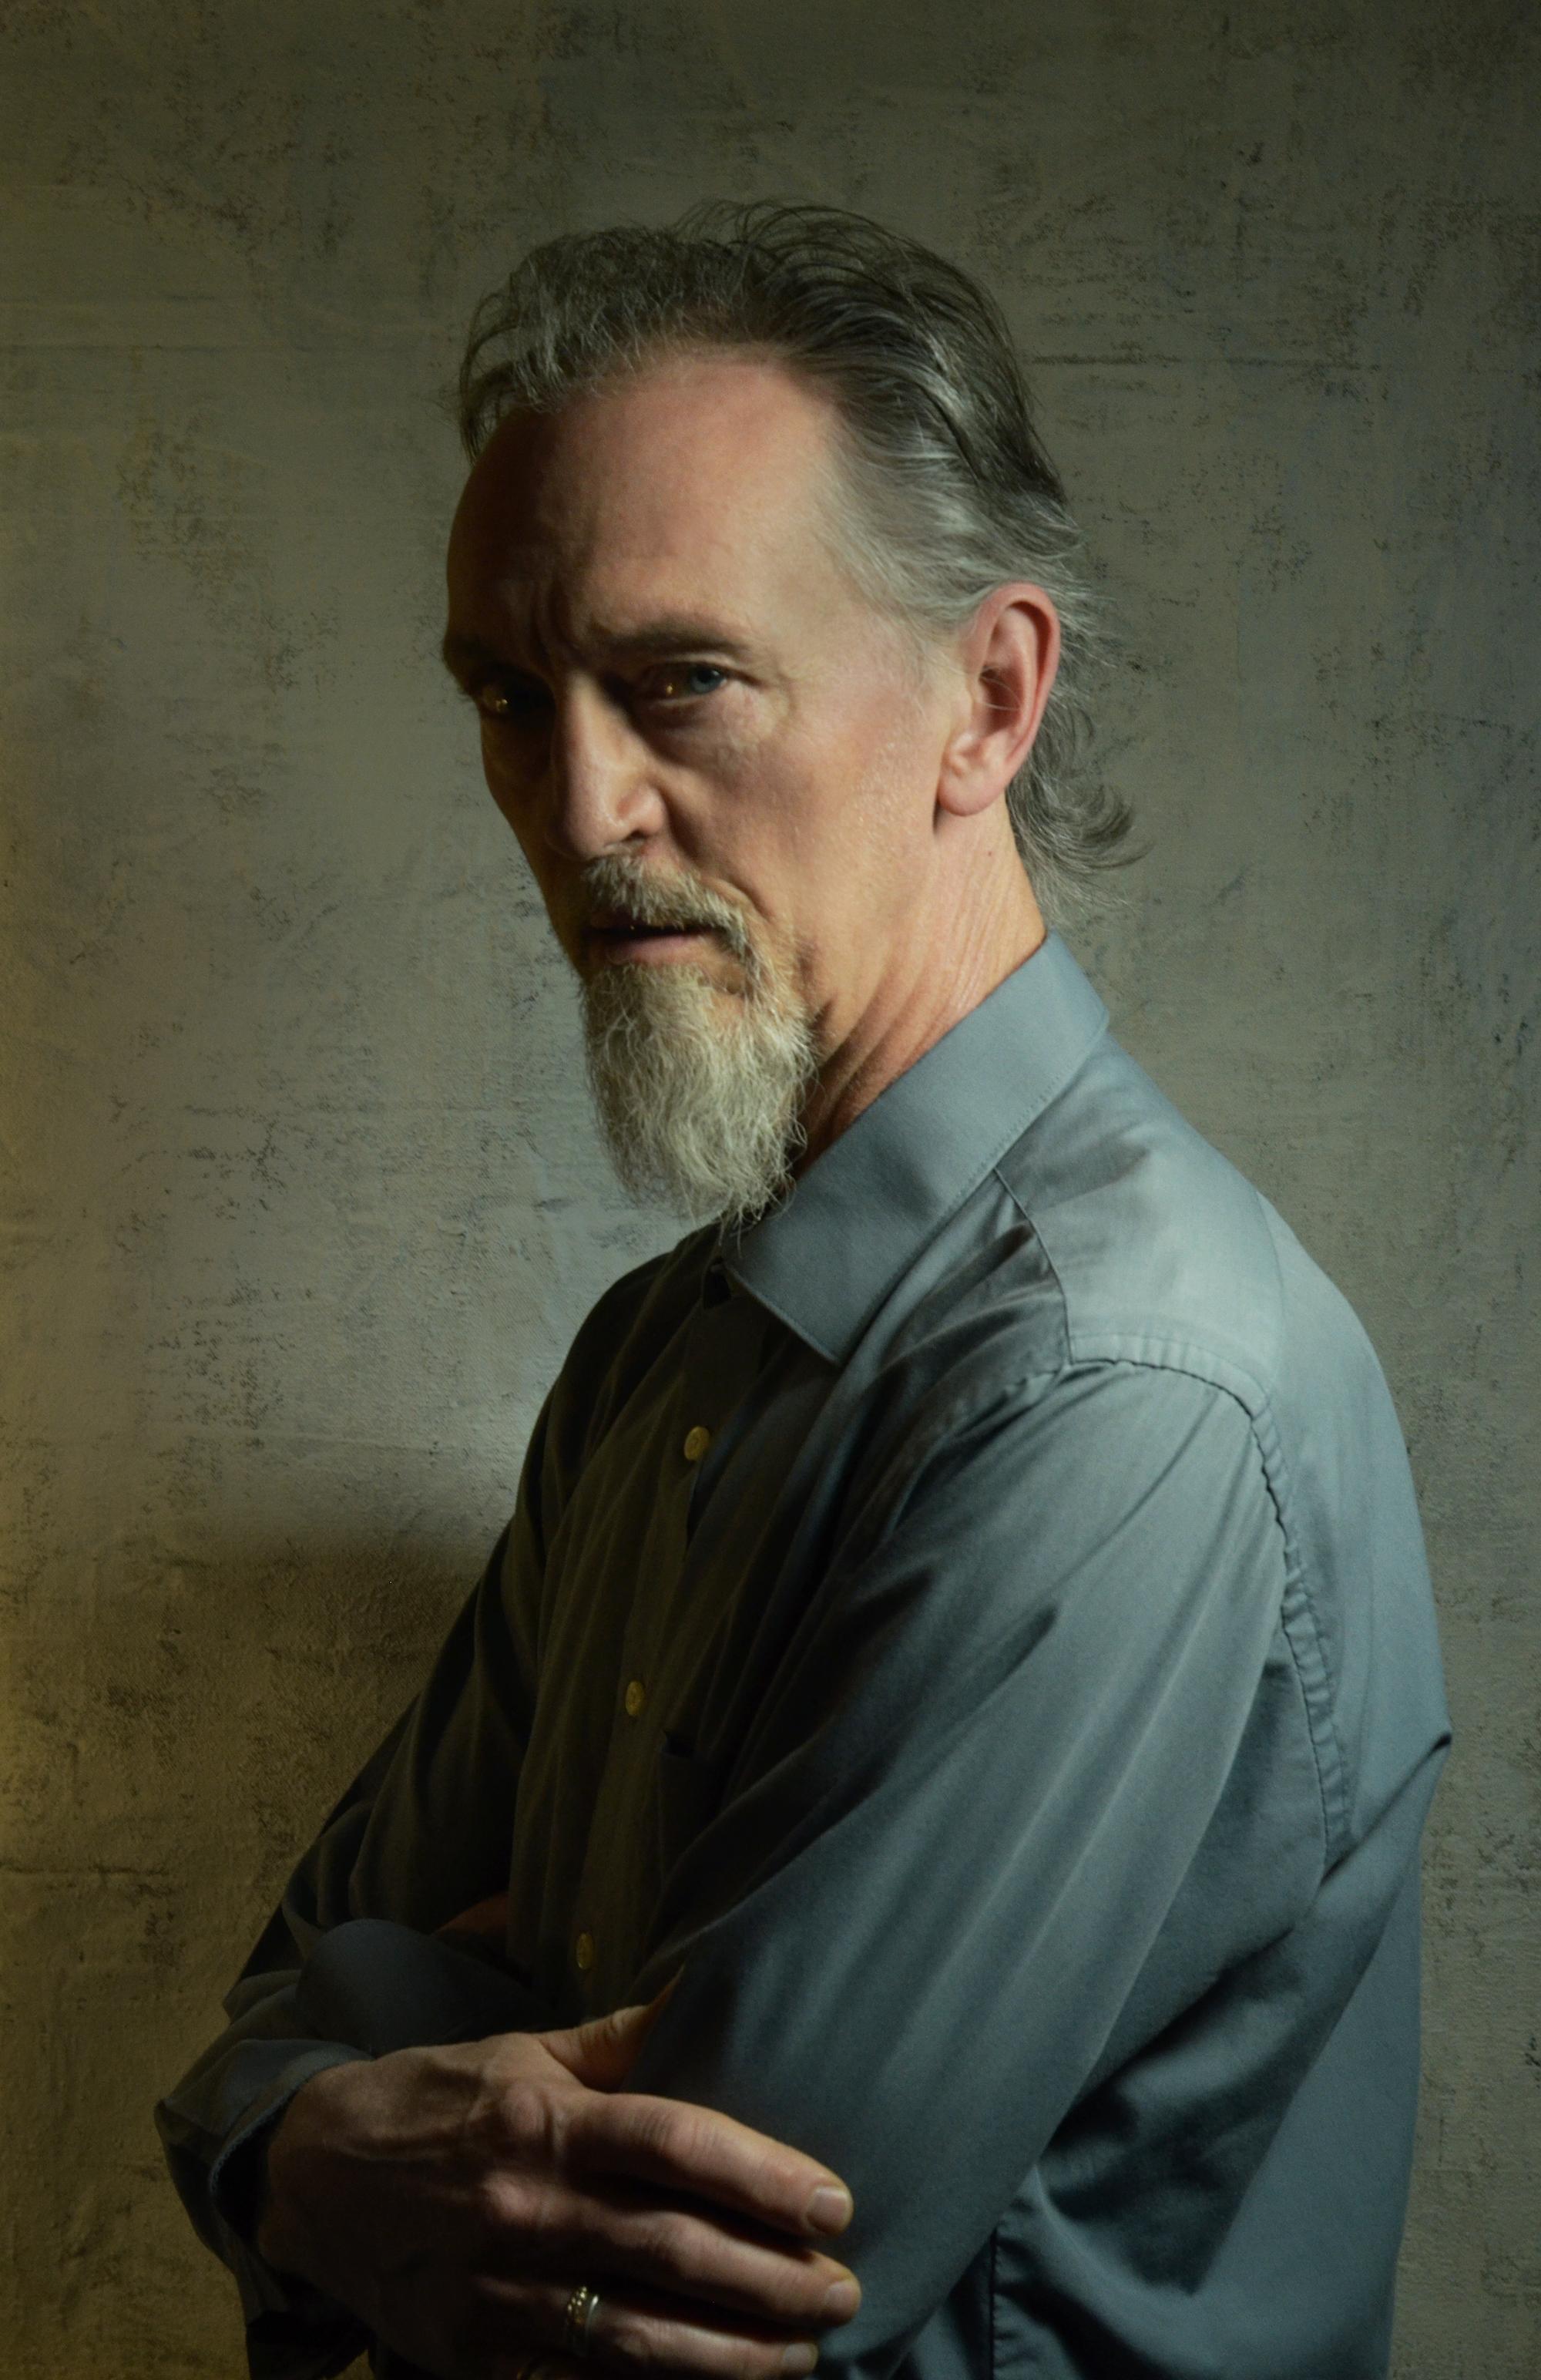 Norman Westberg